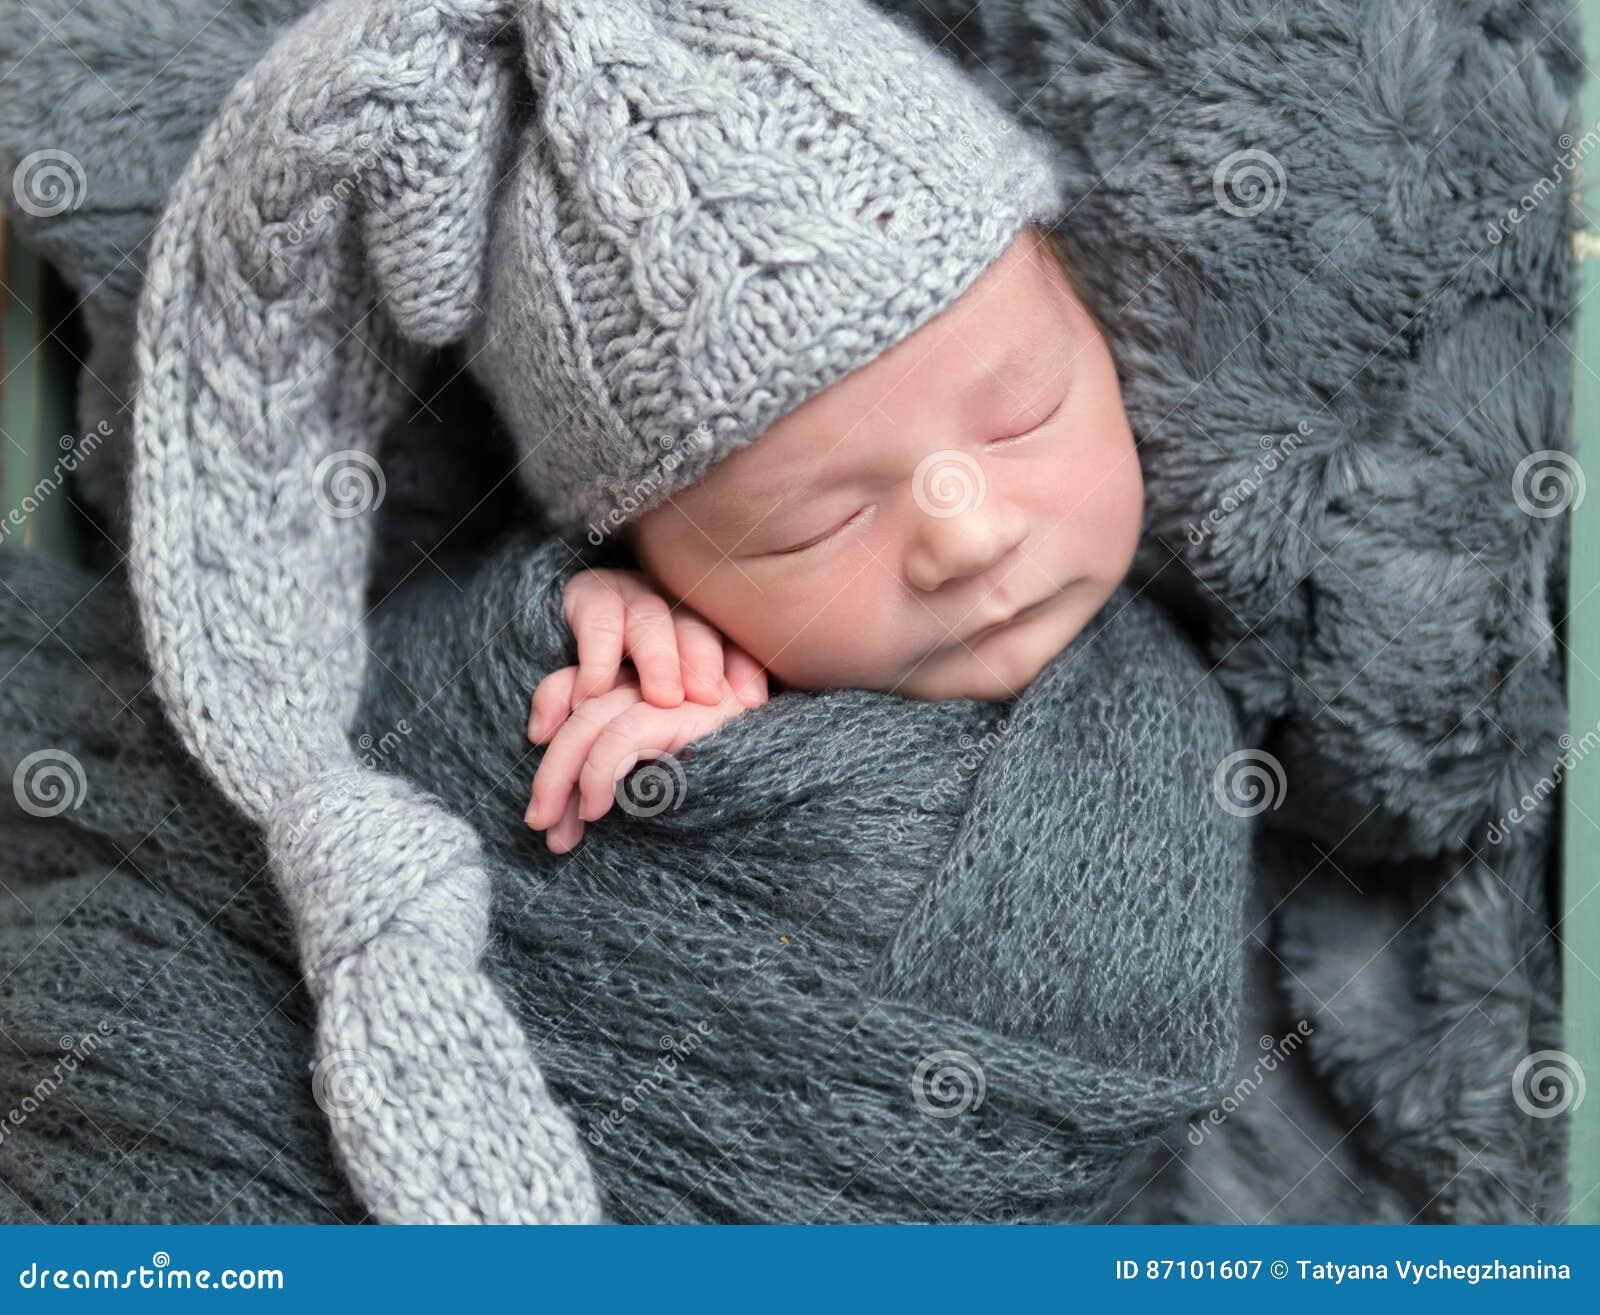 51aea5d5b Cute Child Sleeping In Hat